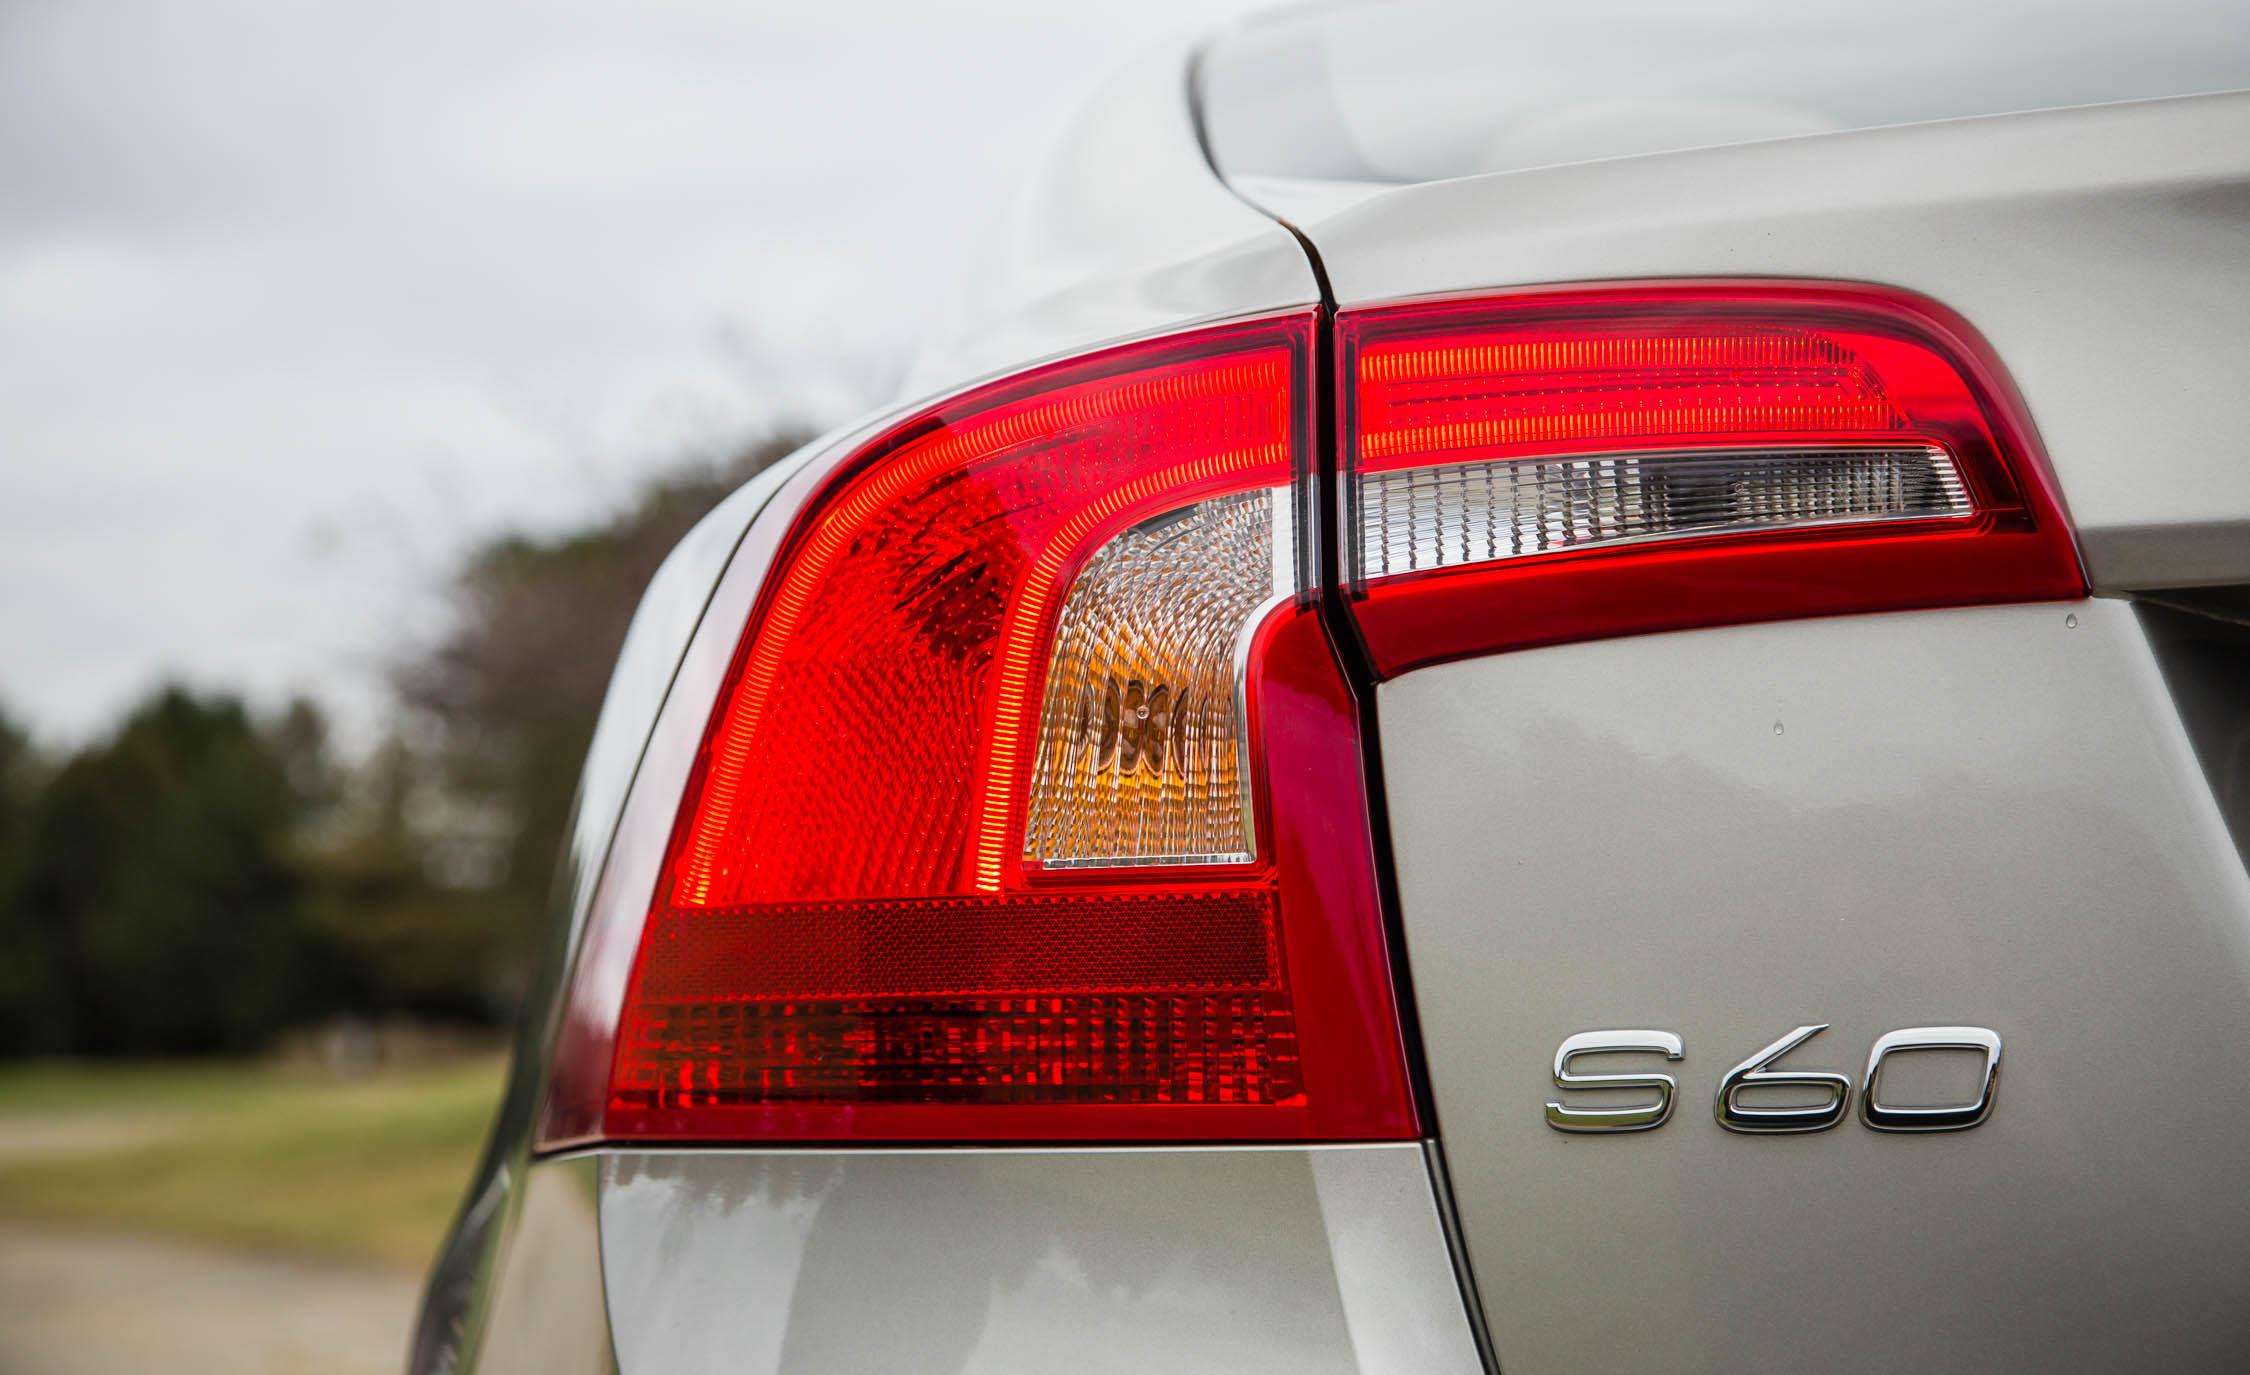 2016 Volvo S60 T5 Inscription Exterior Taillight